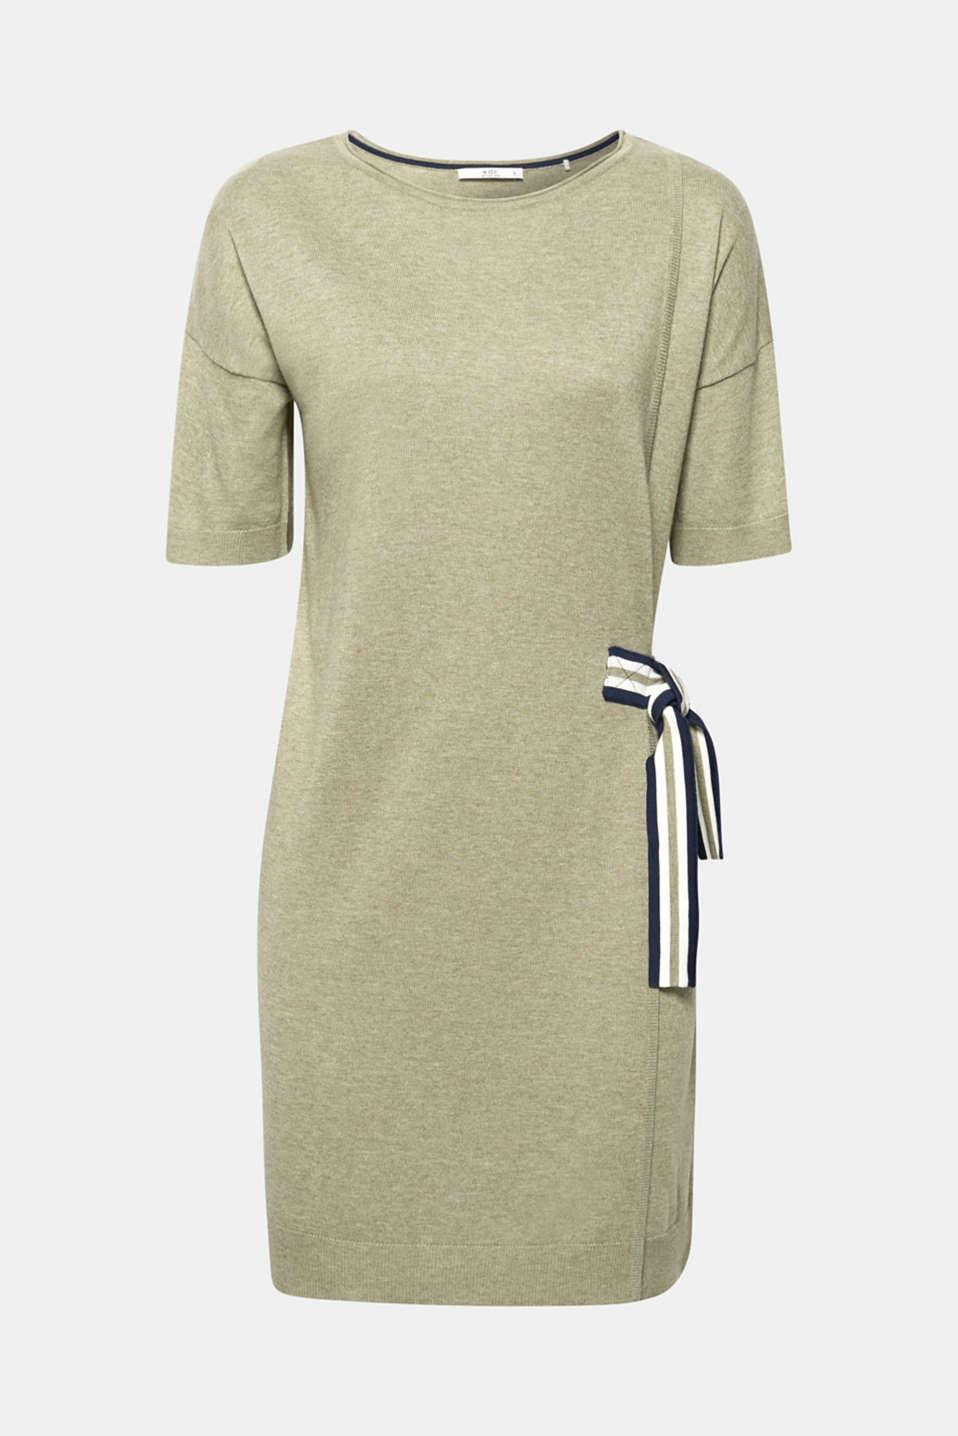 Bow detail knit dress, KHAKI GREEN 5, detail image number 6